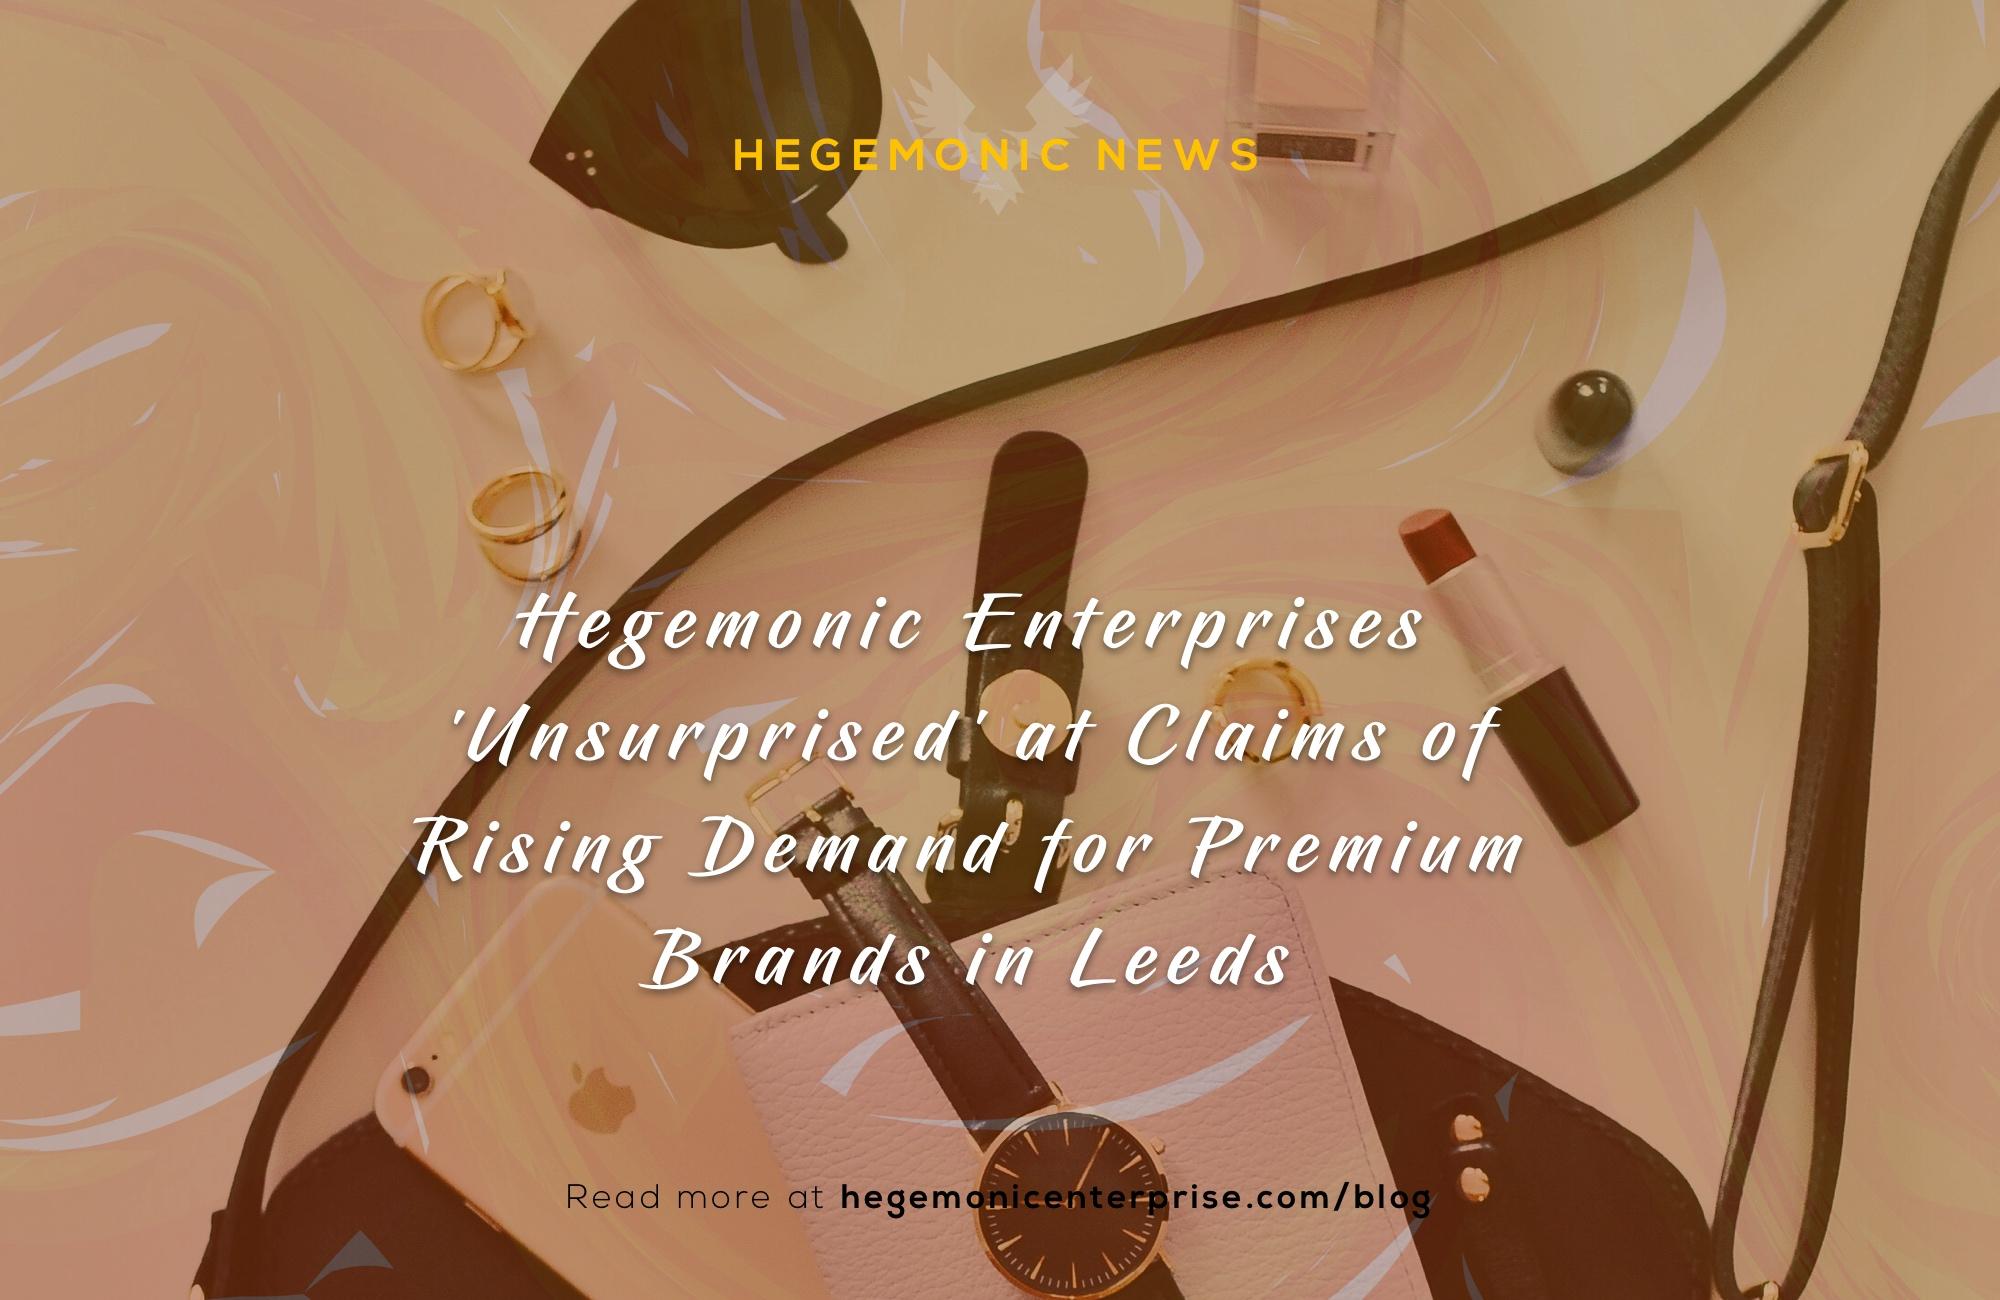 Hegemonic Enterprises 'Unsurprised' at Claims of Rising Demand for Premium Brands in Leeds